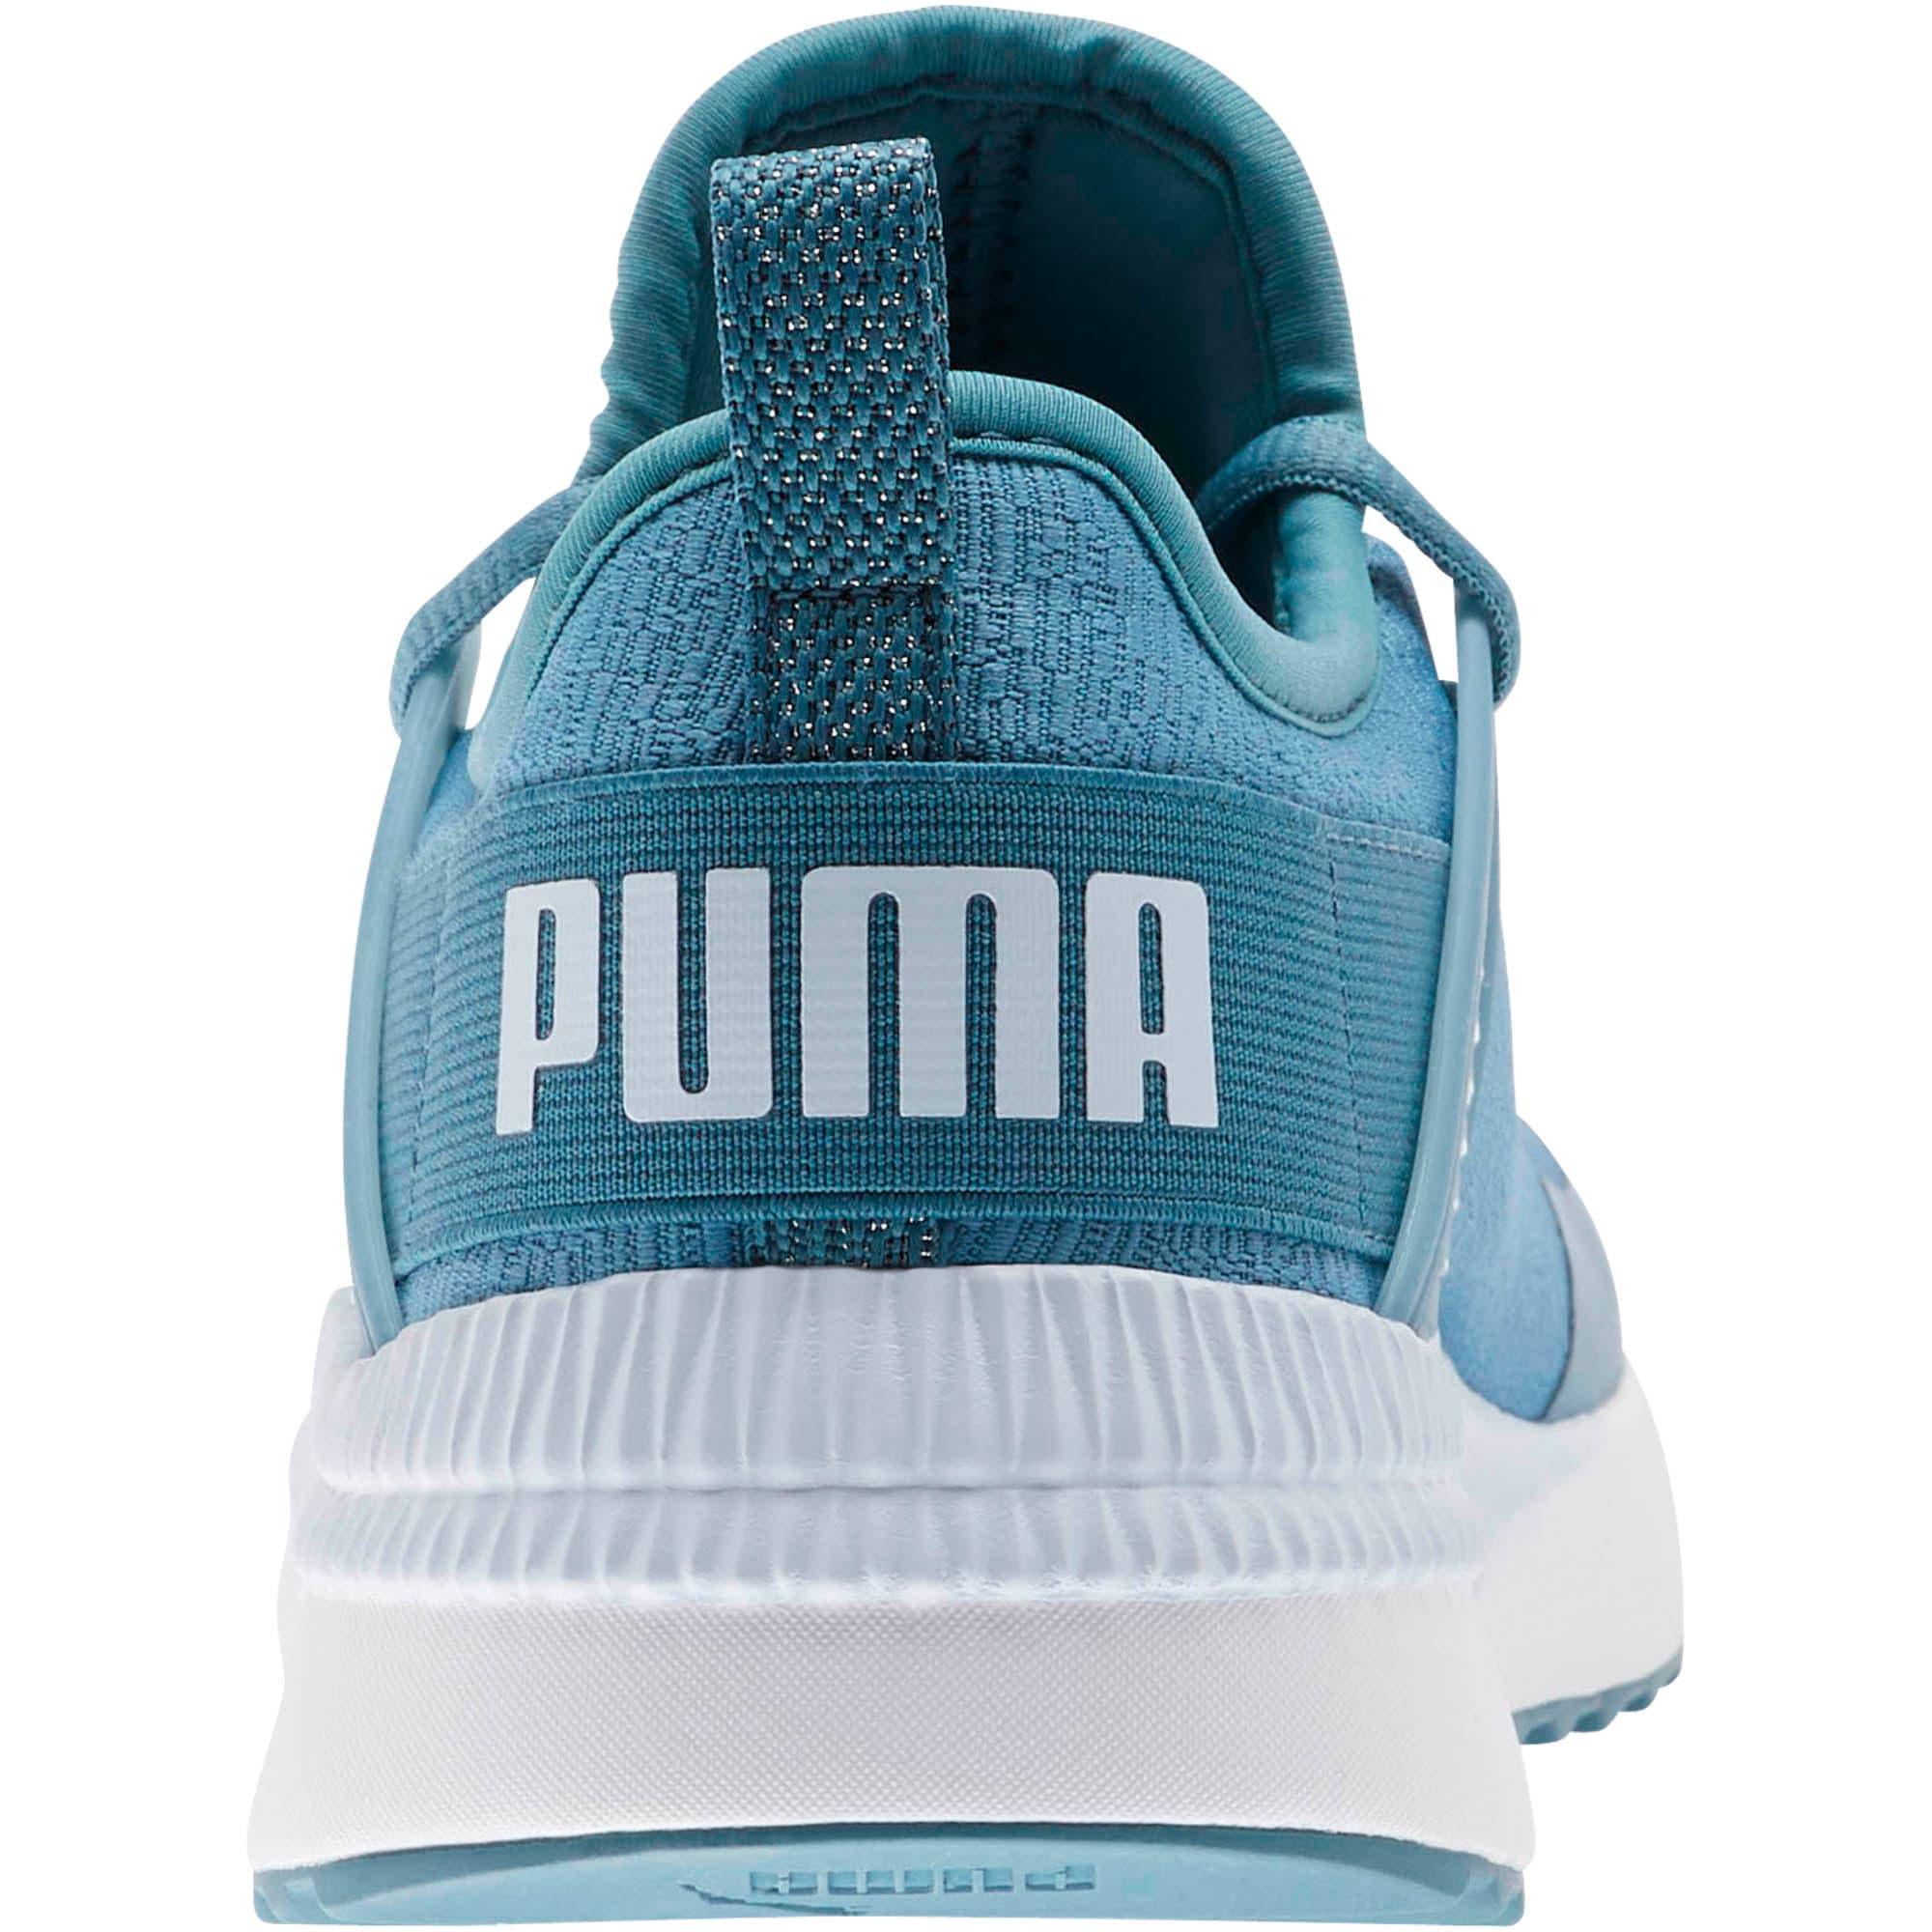 Thumbnail 3 of Pacer Next Cage Glitter Women's Sneakers, Bluestone-Heather-Puma White, medium